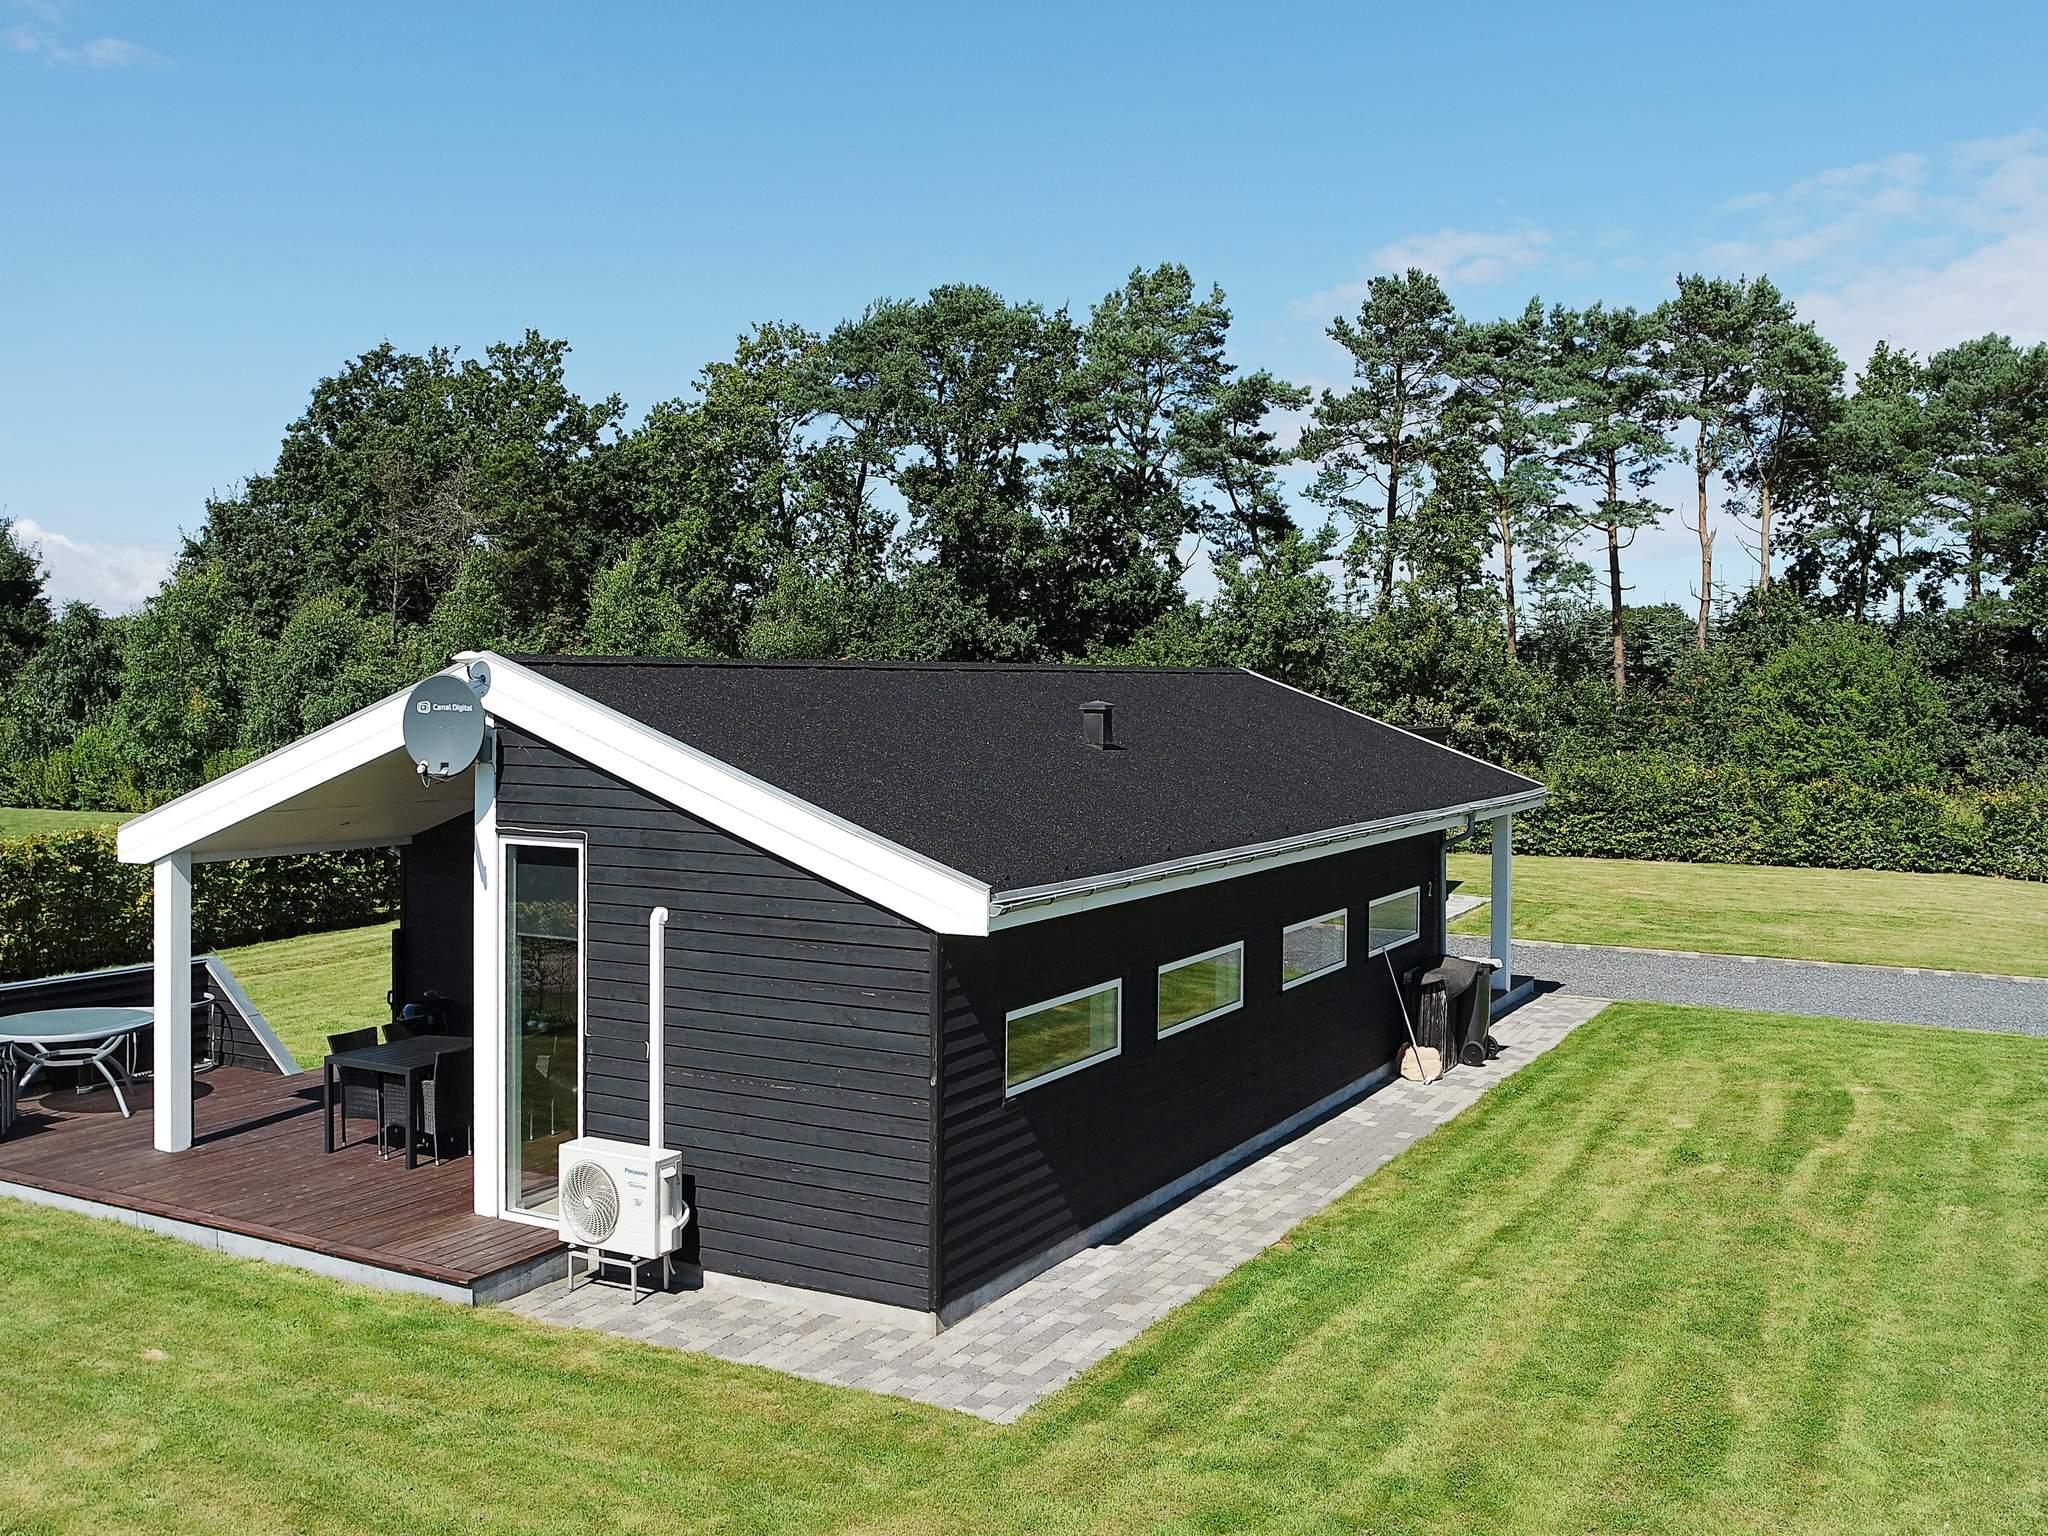 Ferienhaus Øster Hurup (437881), Øster Hurup, , Ostjütland, Dänemark, Bild 16